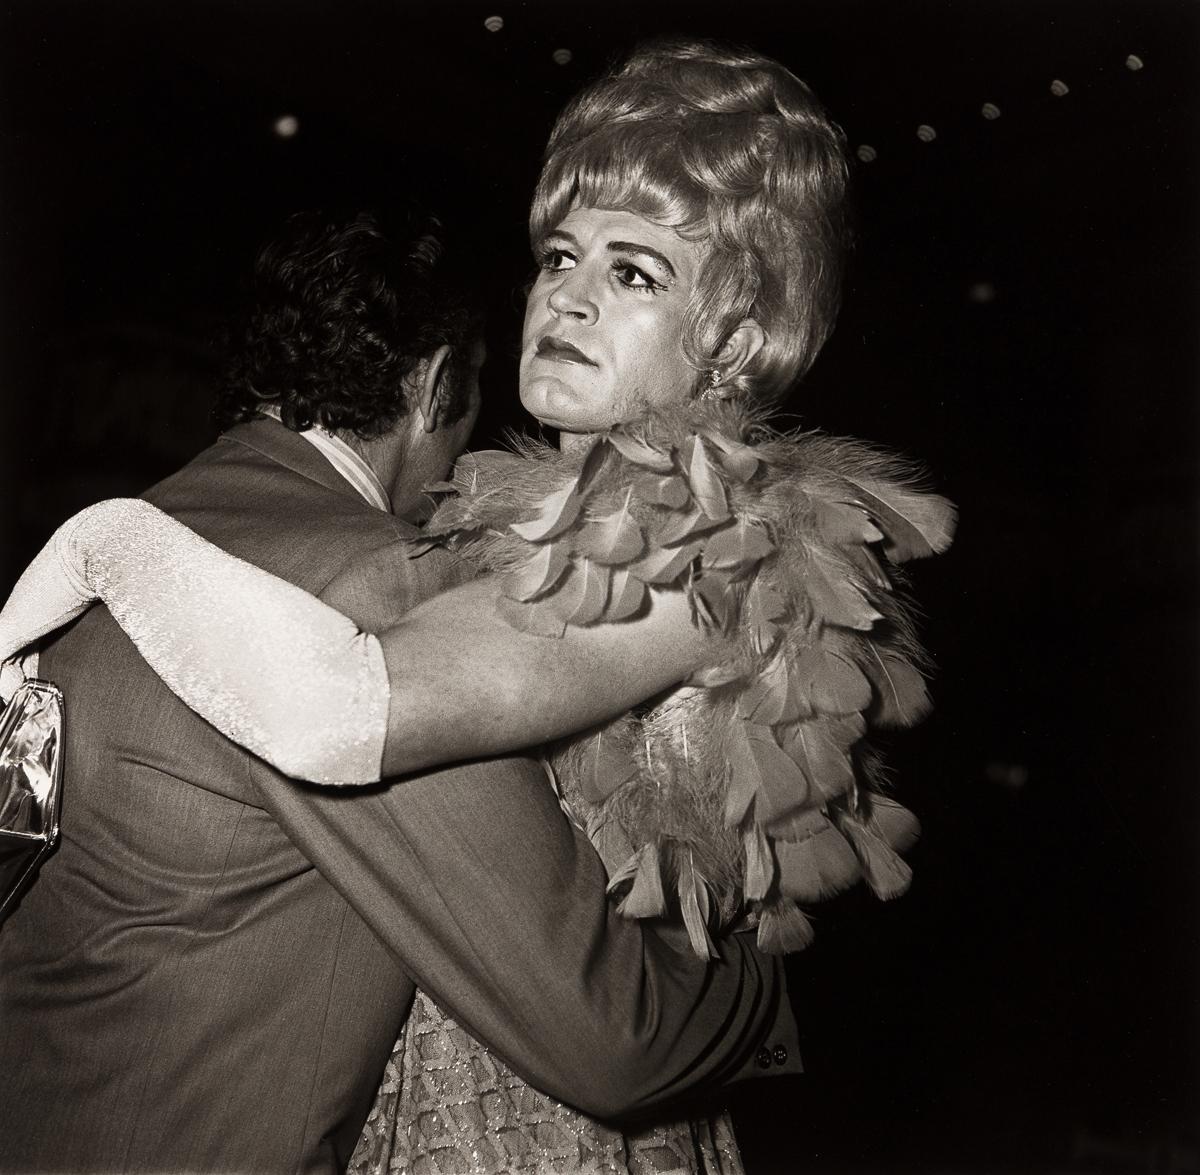 DIANE ARBUS (1923-1971)/NEIL SELKIRK (1947 - ) Two men dancing at a drag ball, NYC.